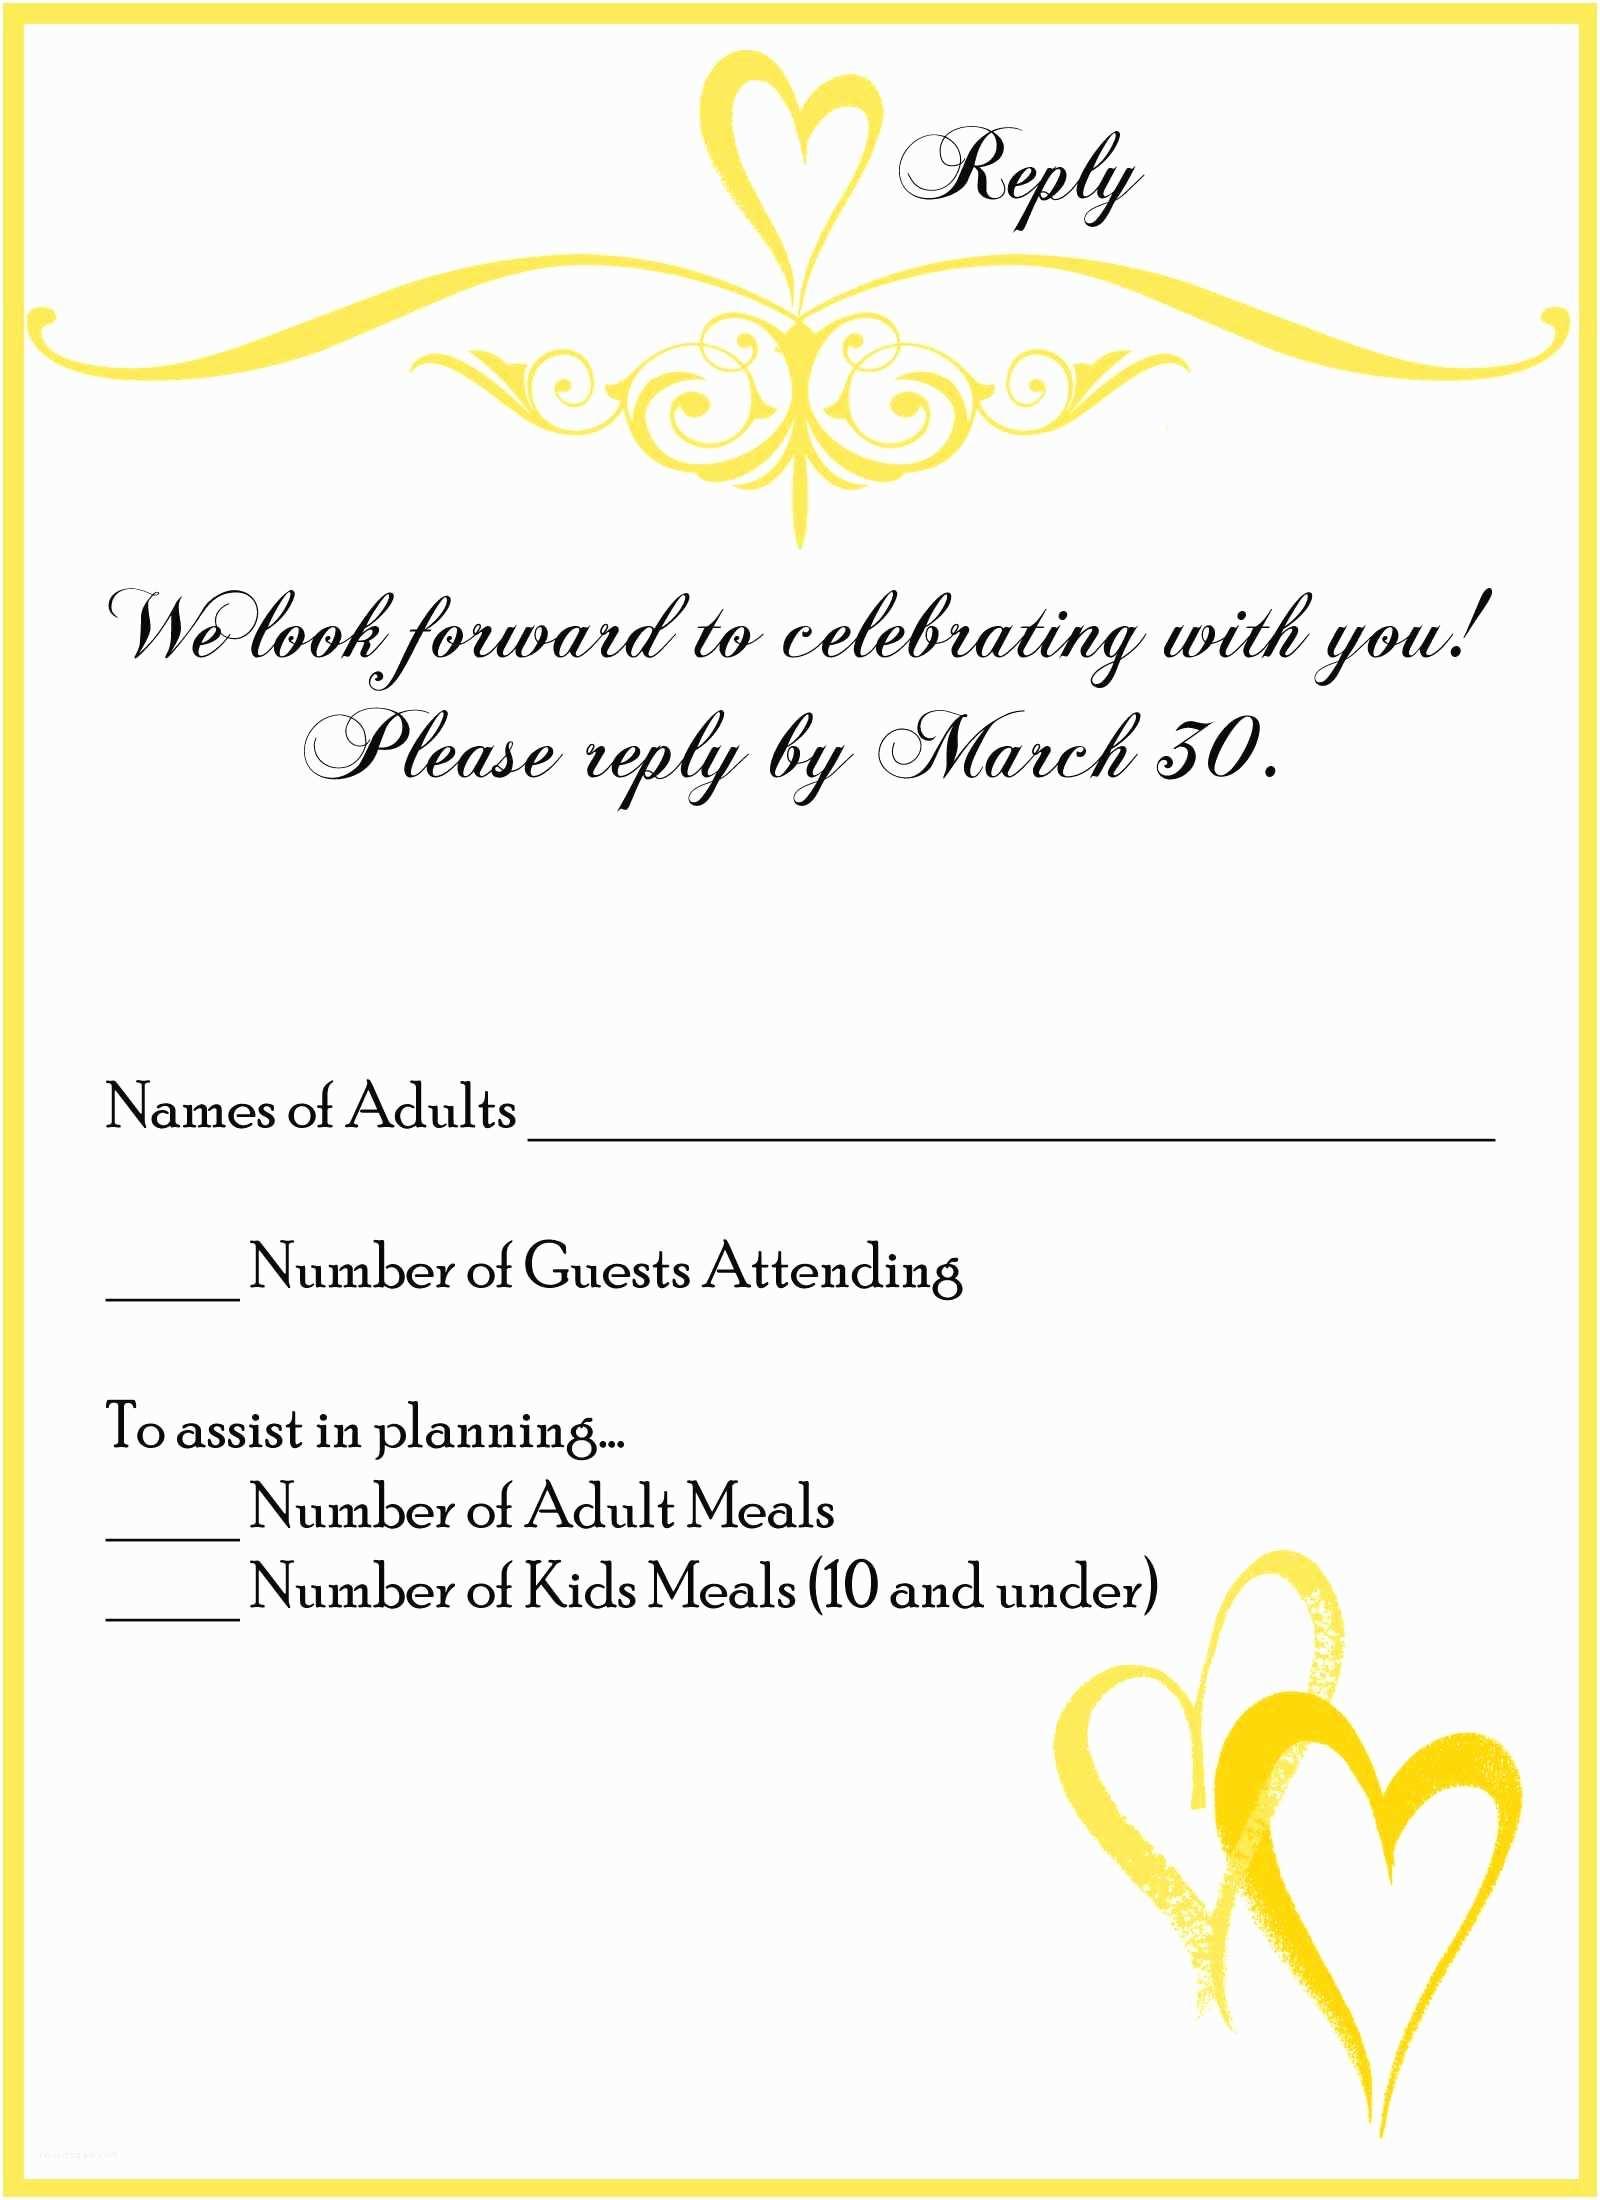 Reply To Wedding Invitation Wedding Invitation Reply Card